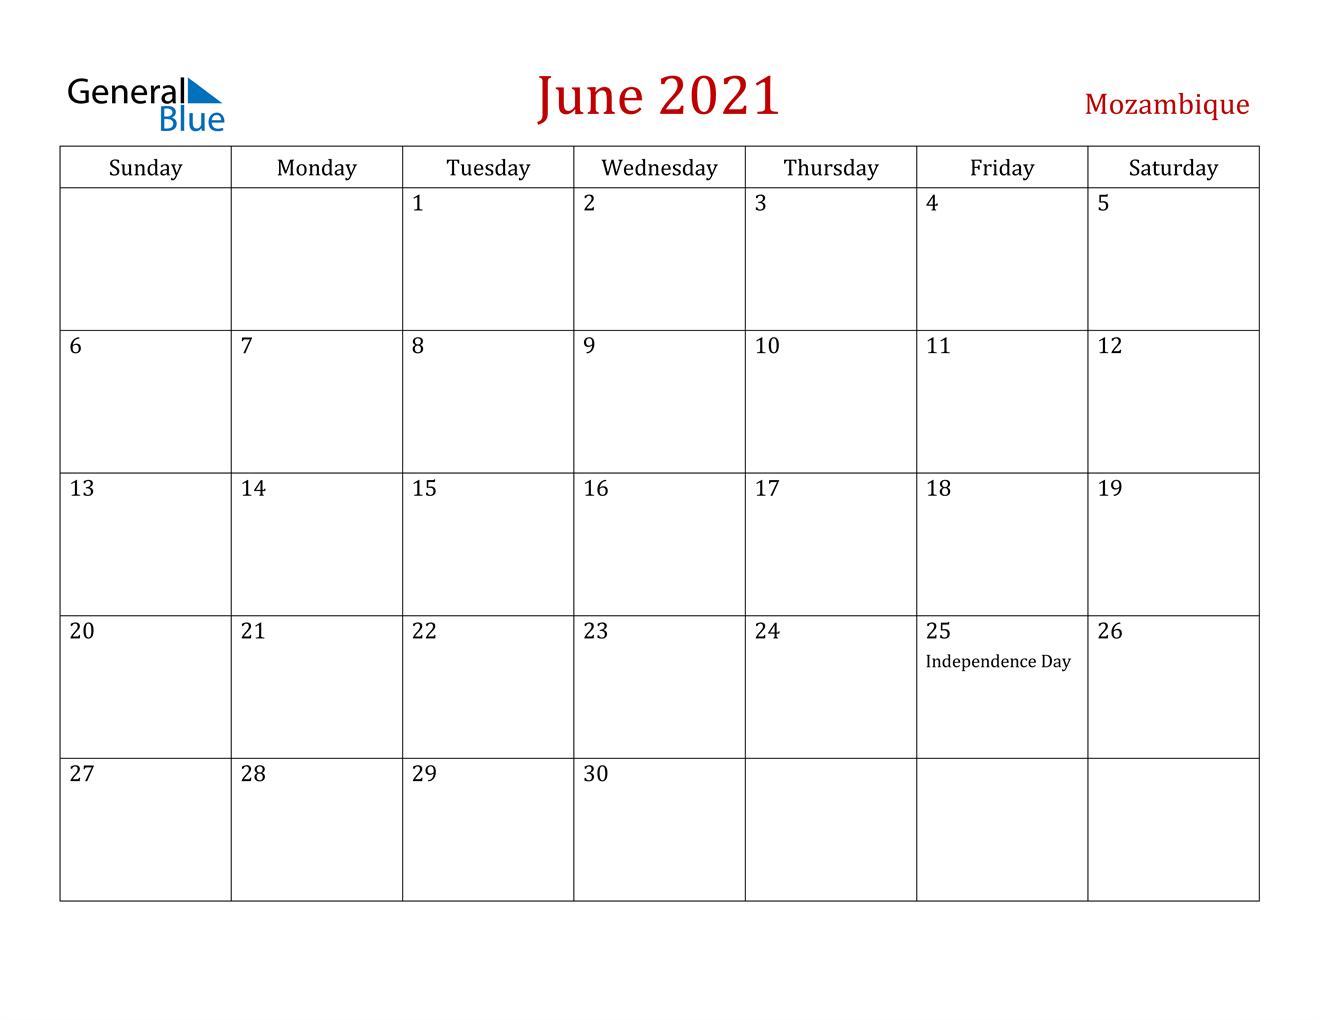 June 2021 Calendar - Mozambique